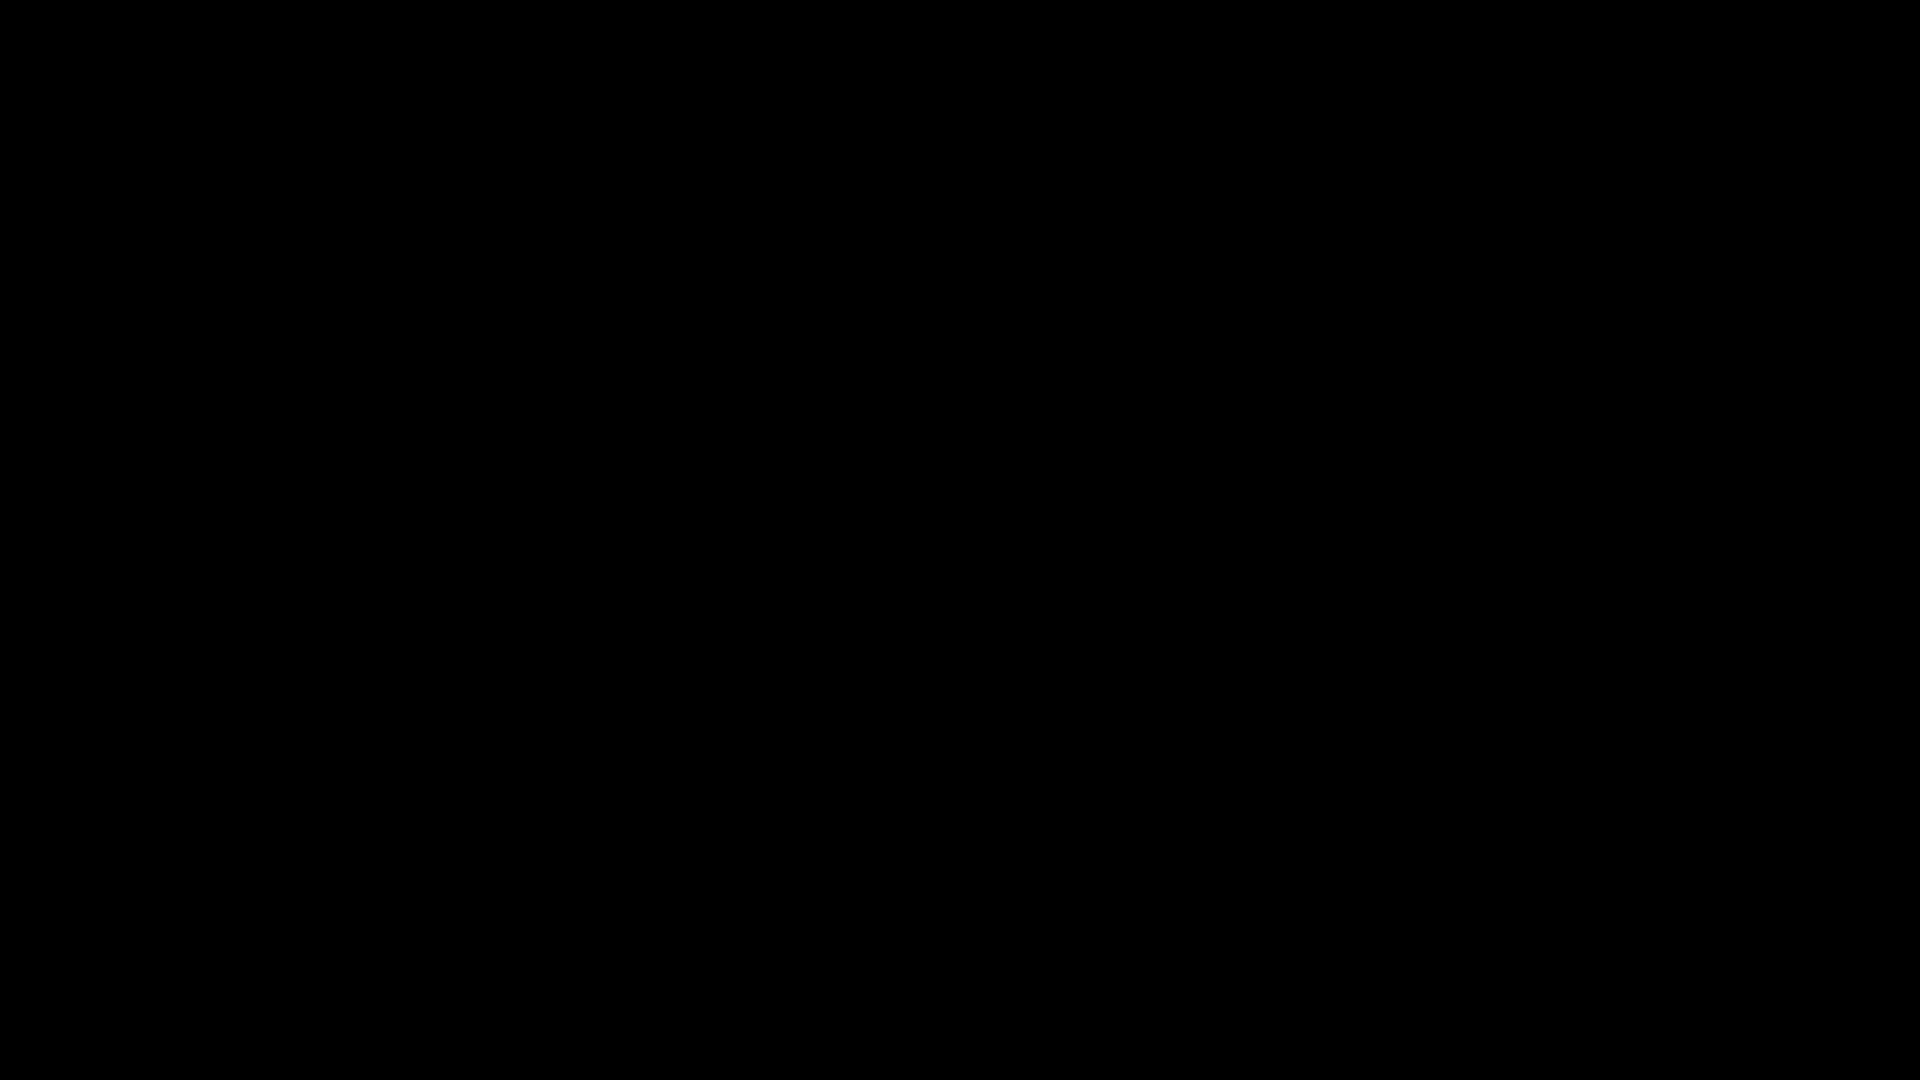 a thousand miles, acrylo, acryloyt, animation, drawing, fl, fl studio, piano, piano girl, piano song, soundcloud, tutorial, vanessa carlton, vevo, xx, xxx, xxxtentacion, xxxtentacion funny, xxxtentacion white, xxxtentacion white girl, If XXXTENTACION was a white girl GIFs